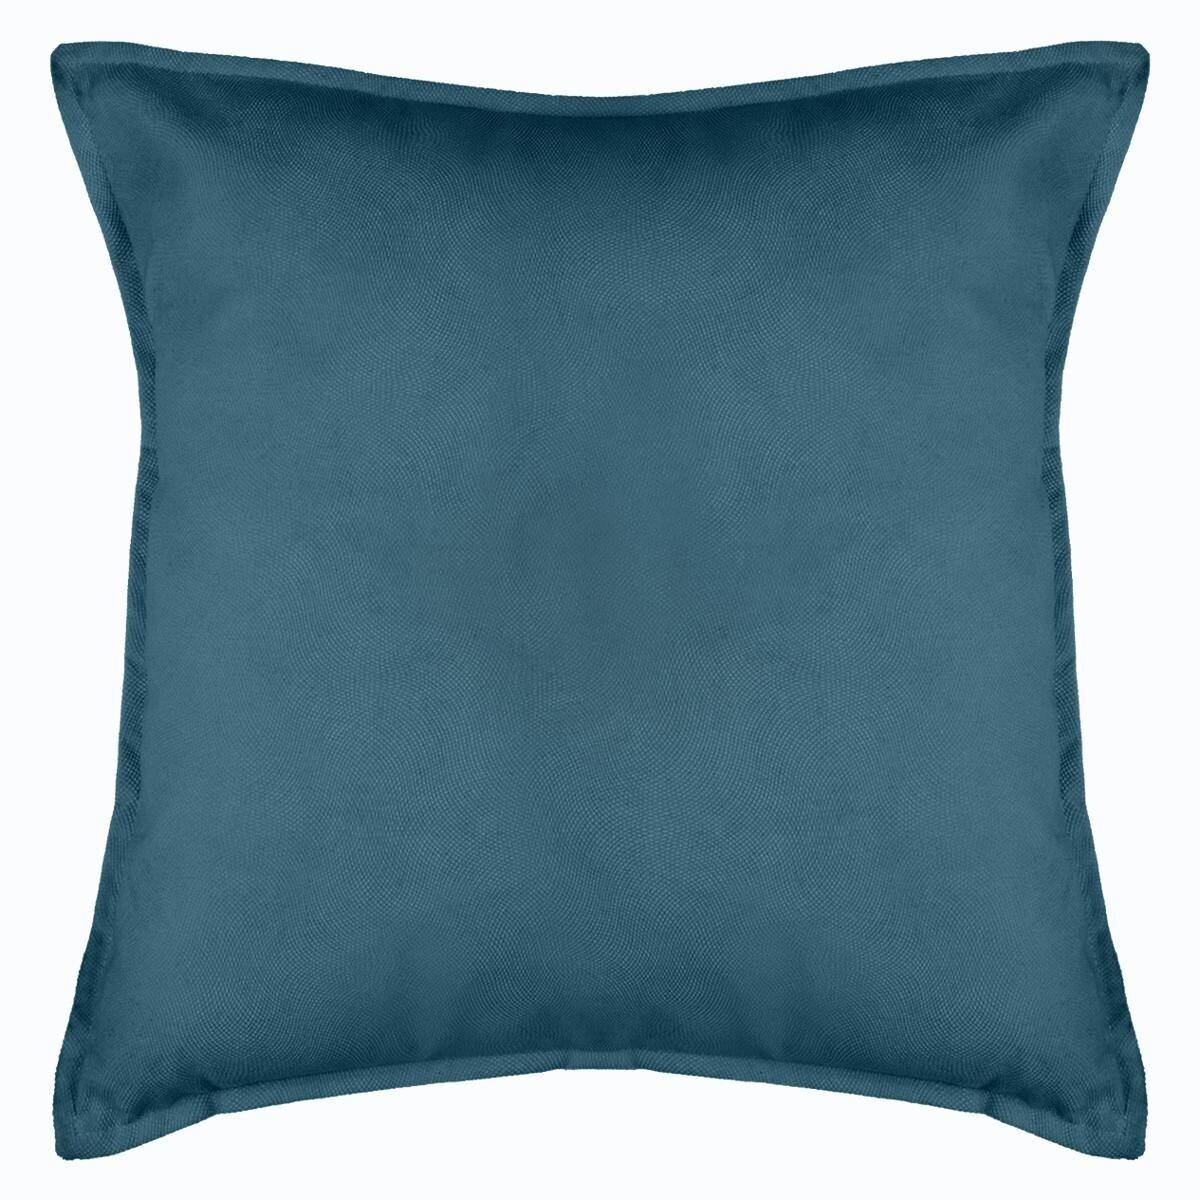 Atmosphera Coussin 'Lilou', bleu 55x55 cm DTE_AH2019 Unisexe